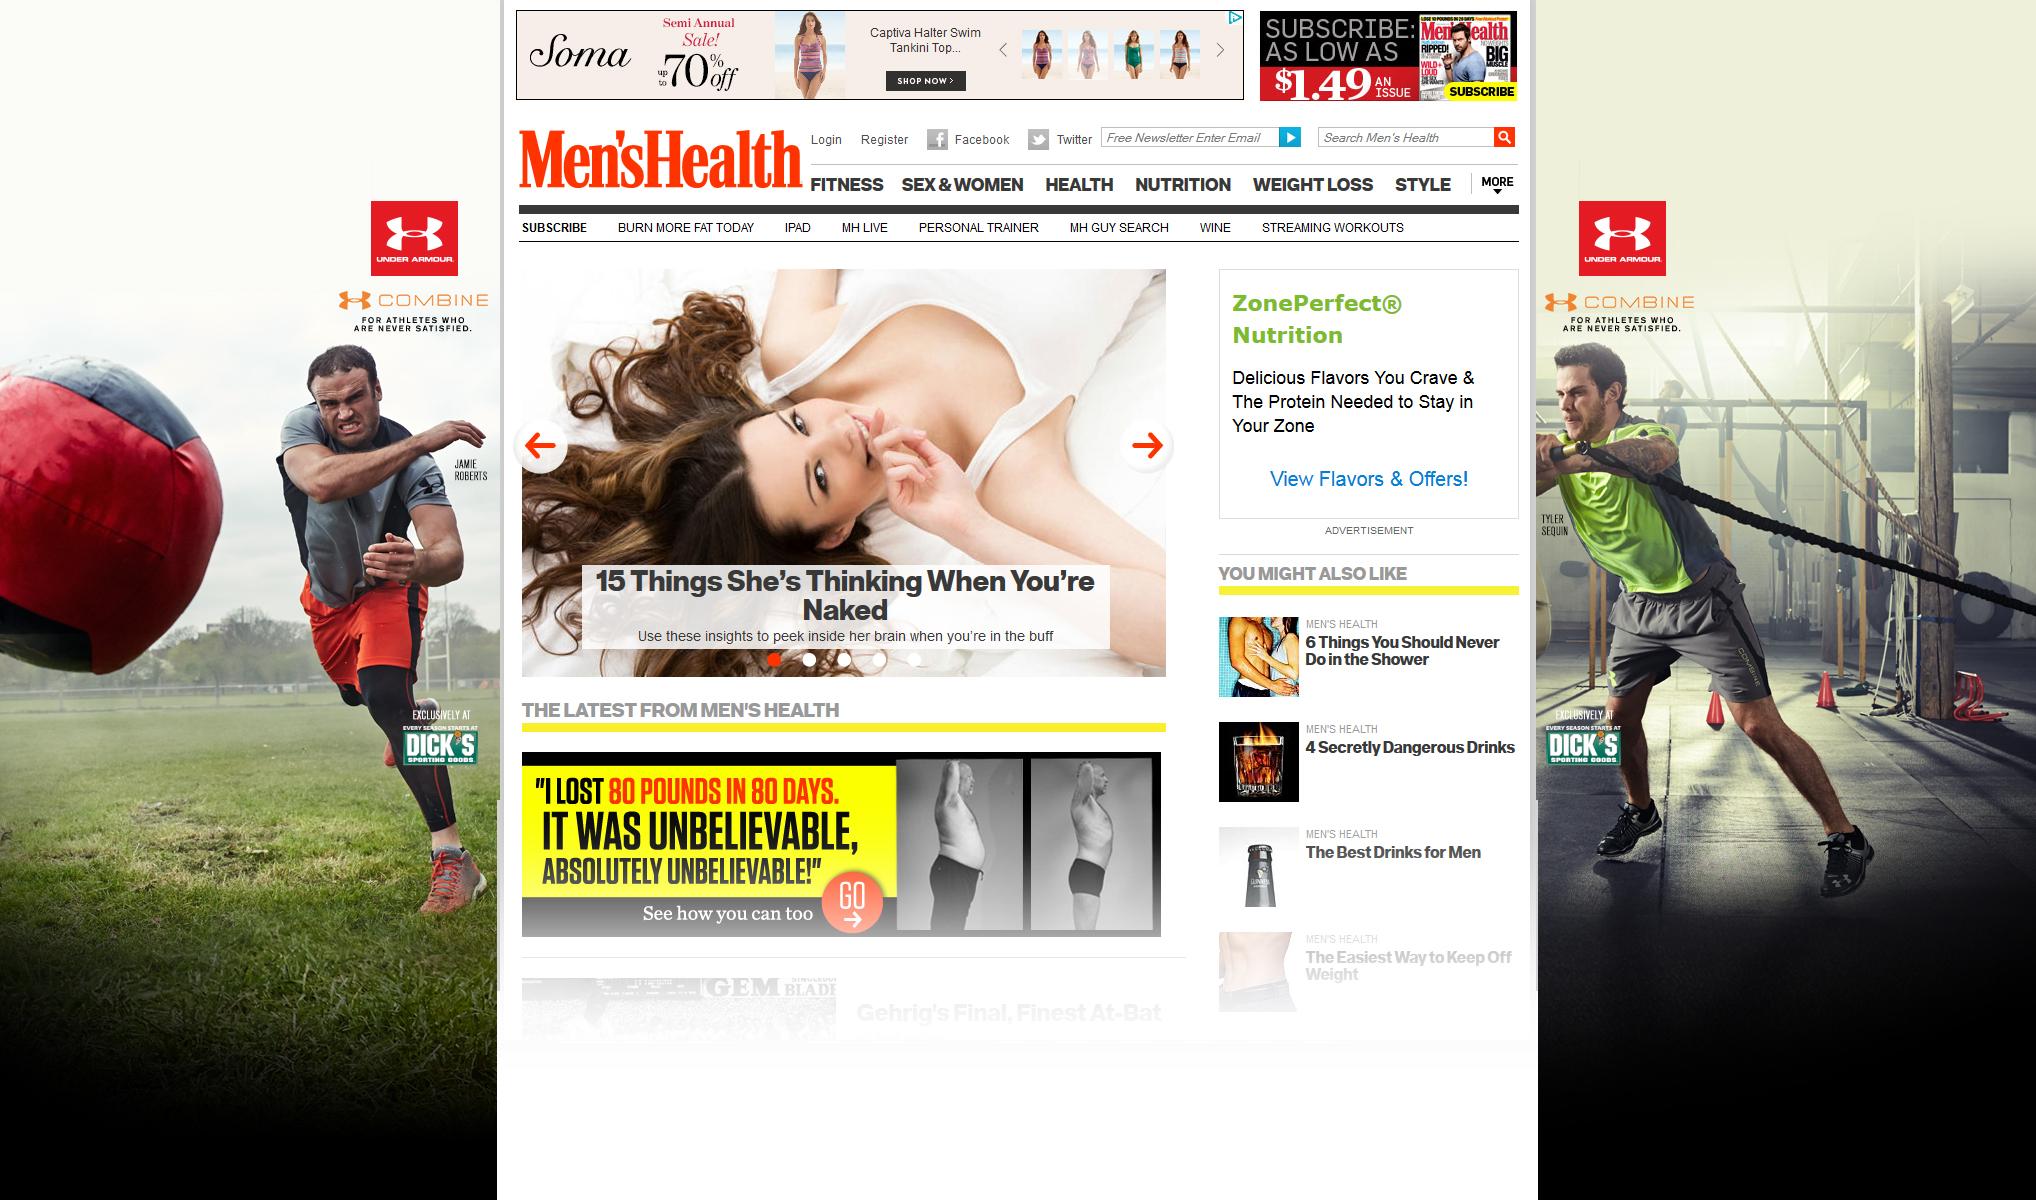 Under Armour - Combine - Mens Health Skin